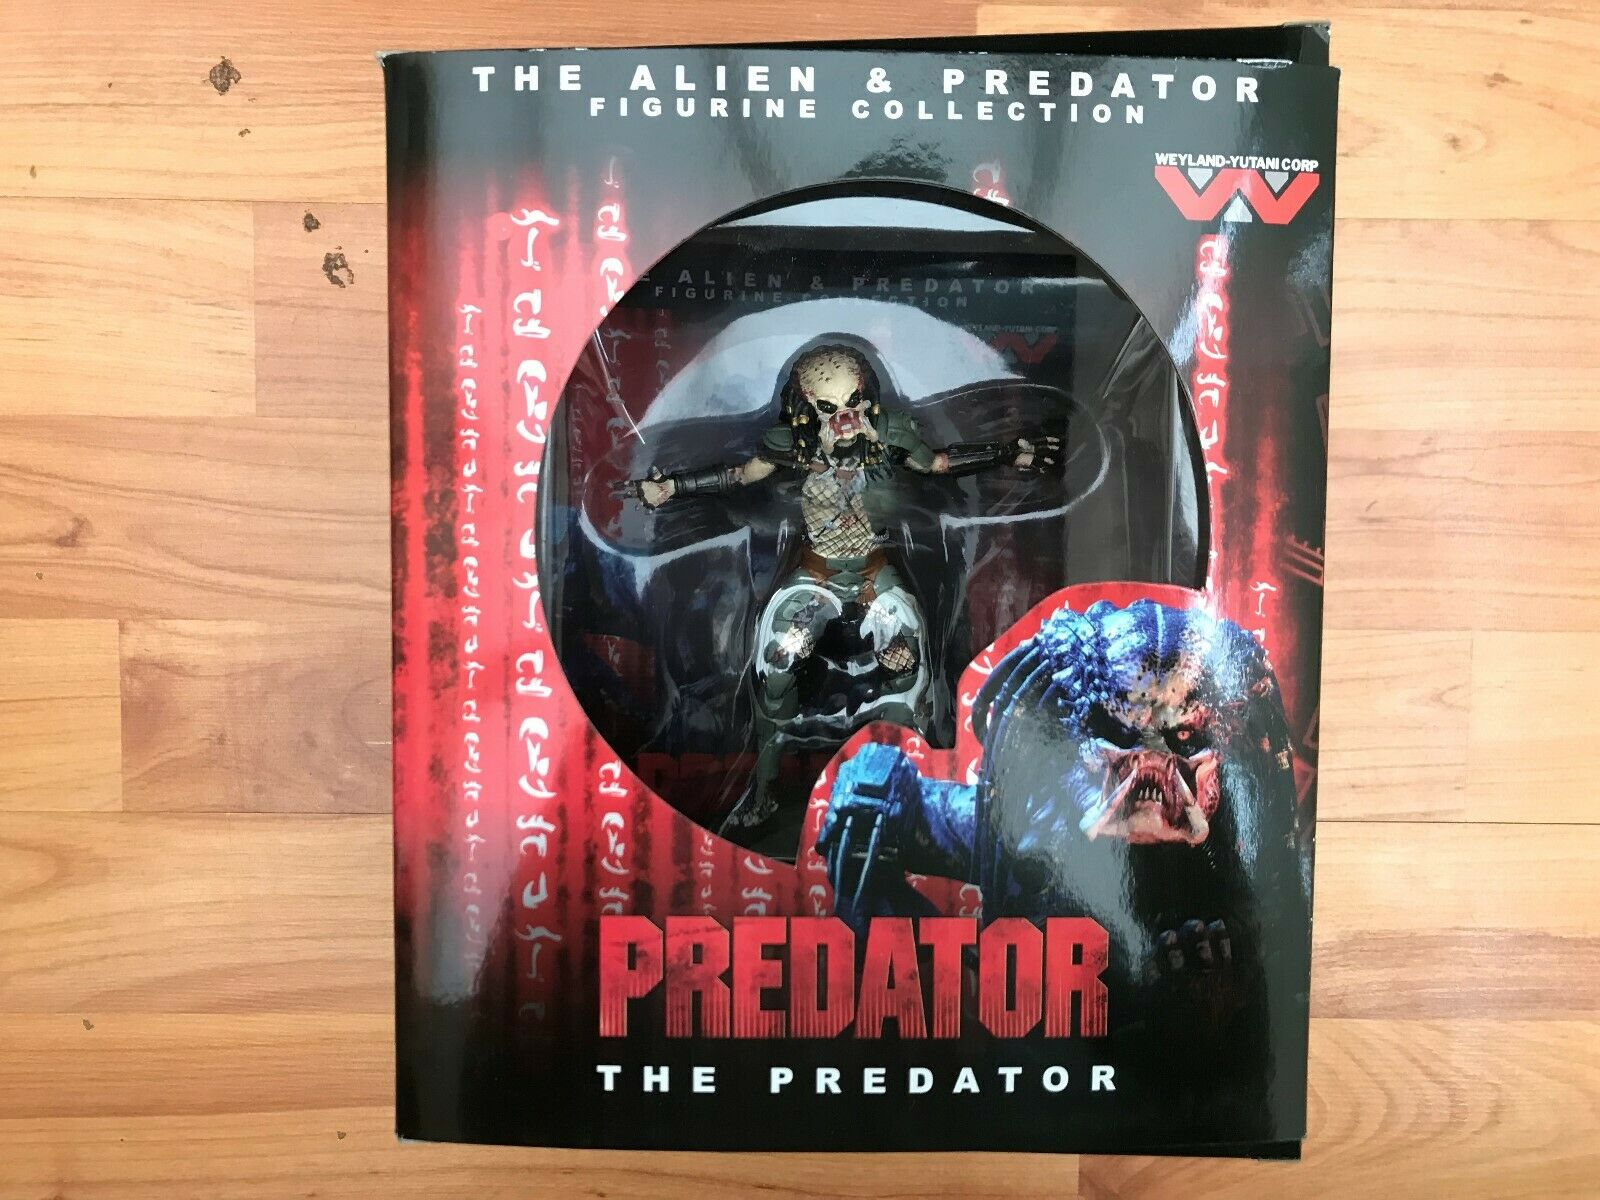 AVP THE ALIEN & ProtATORS FIGURINE EAGLEMOSS COLLECTION ISSUE  5 THE ProtATOR